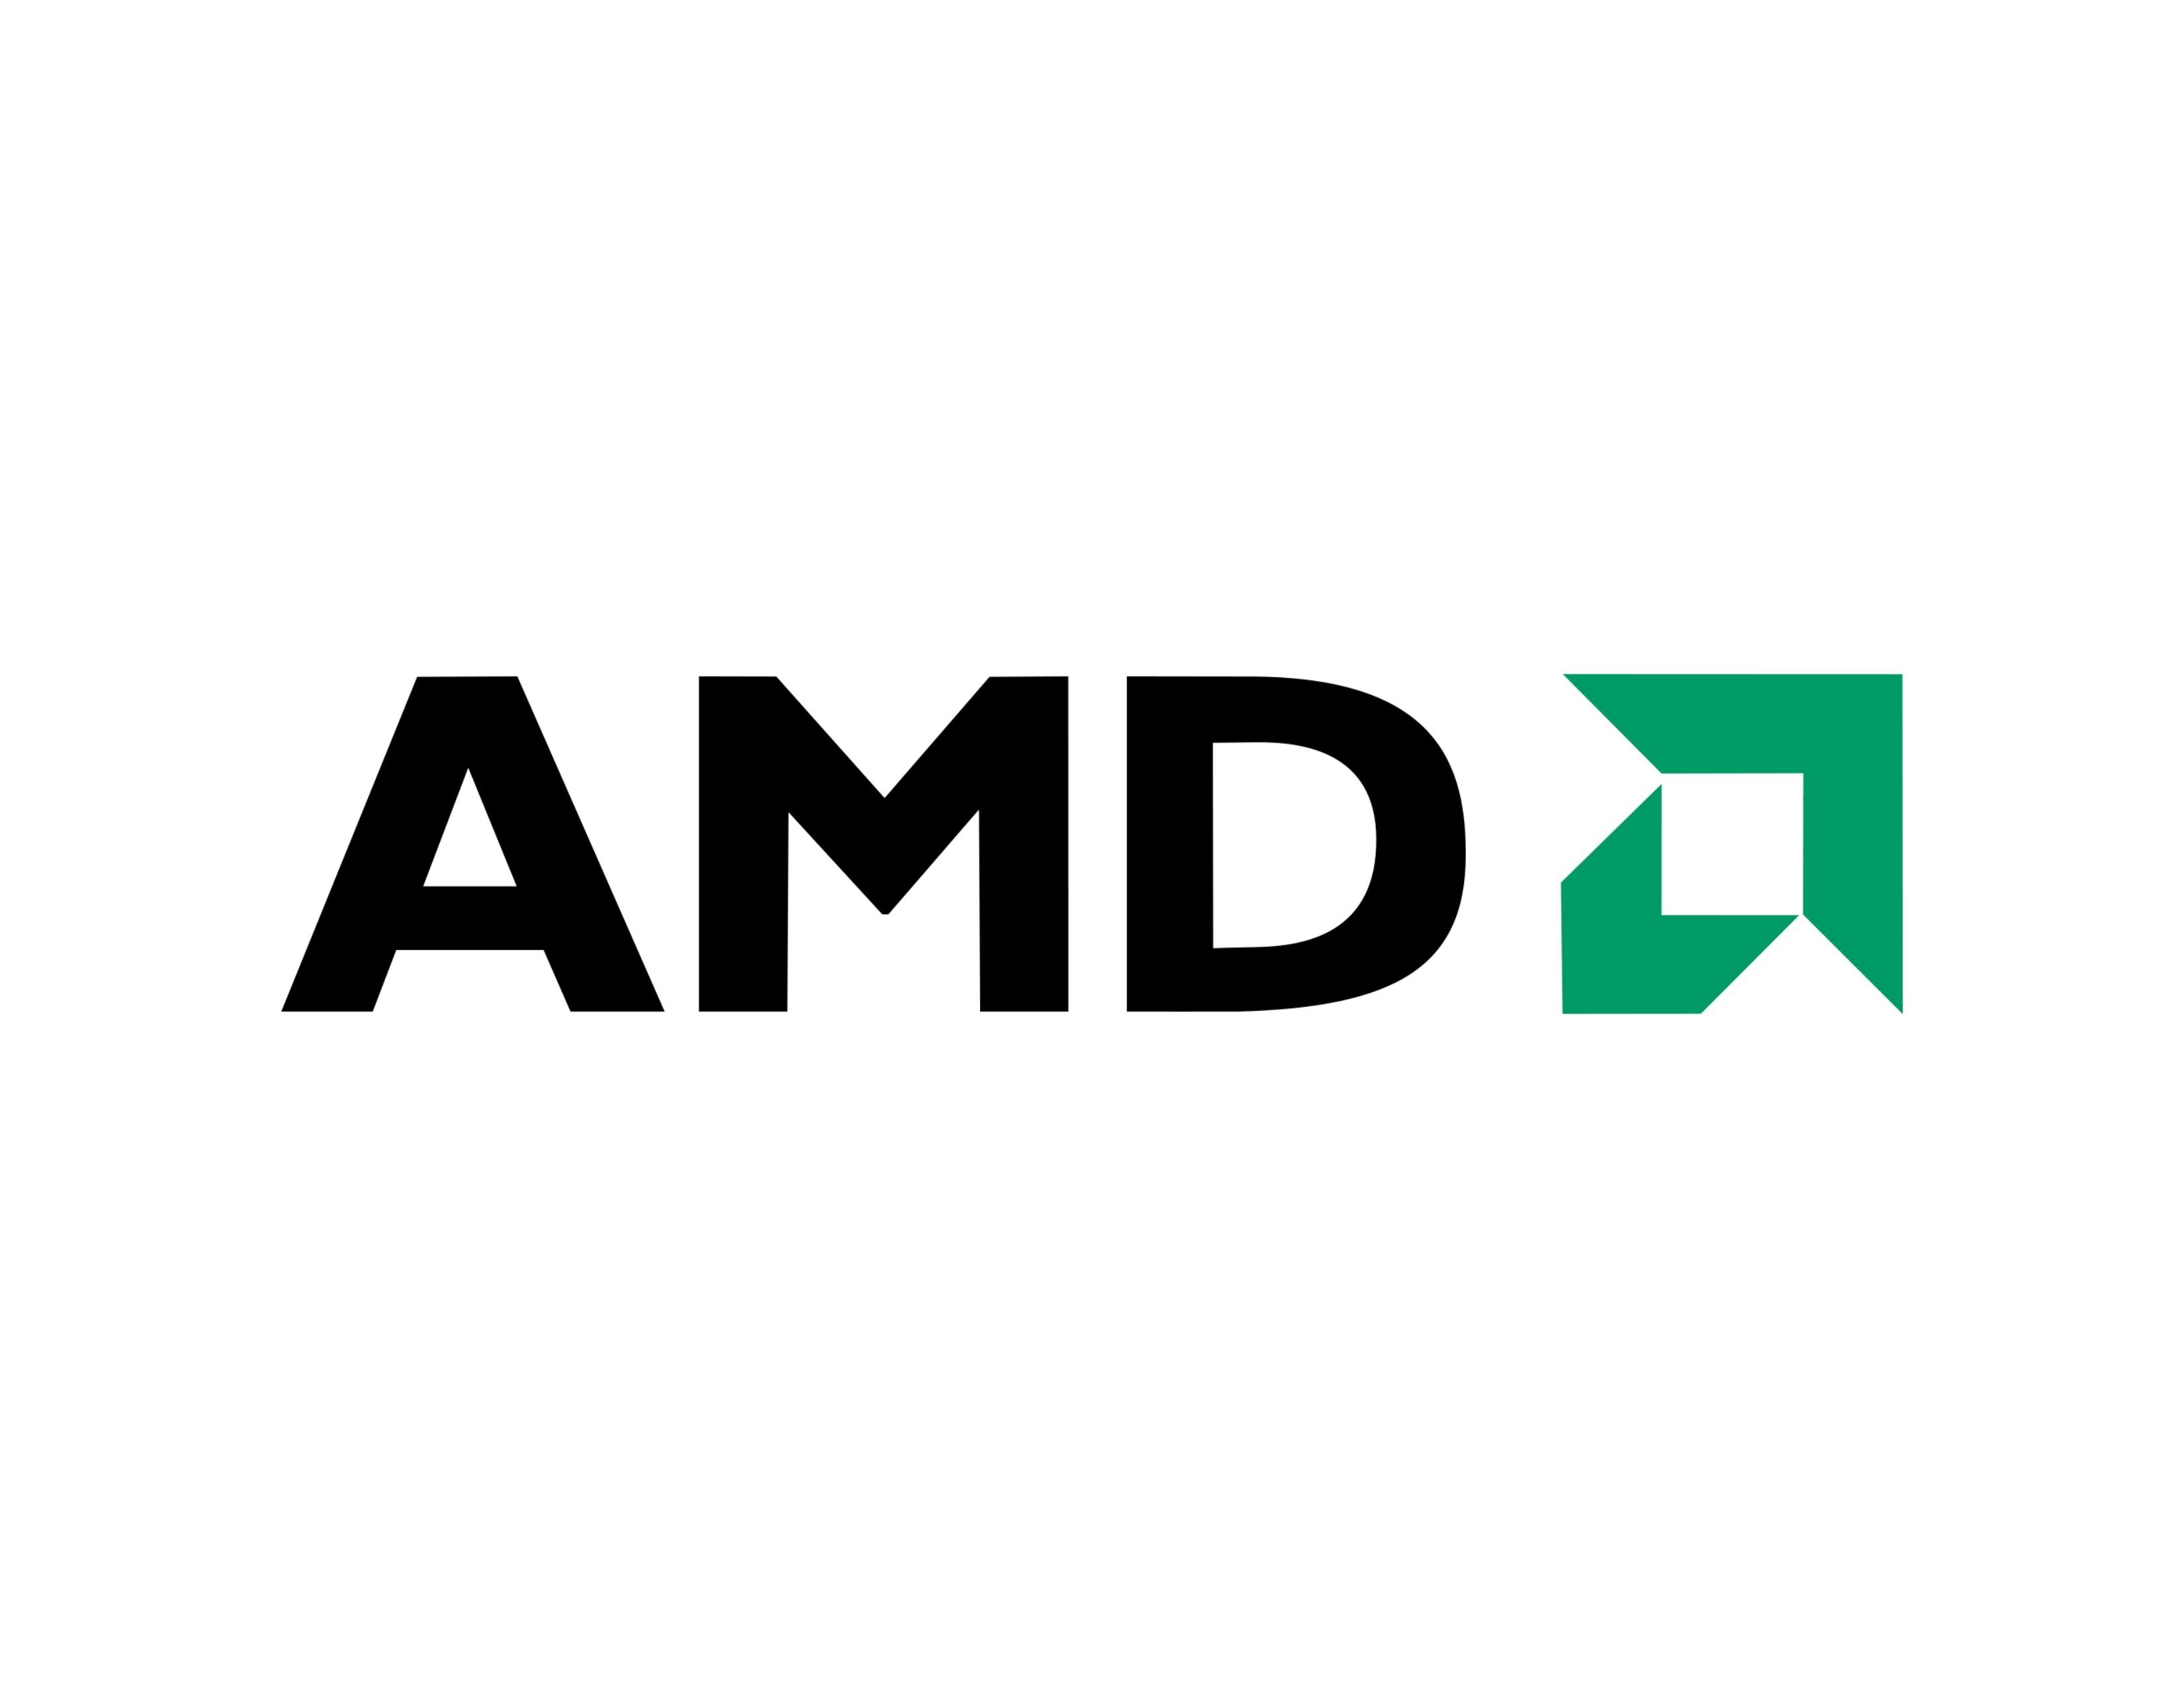 Drawn amd logo YouTube in Corel logo to